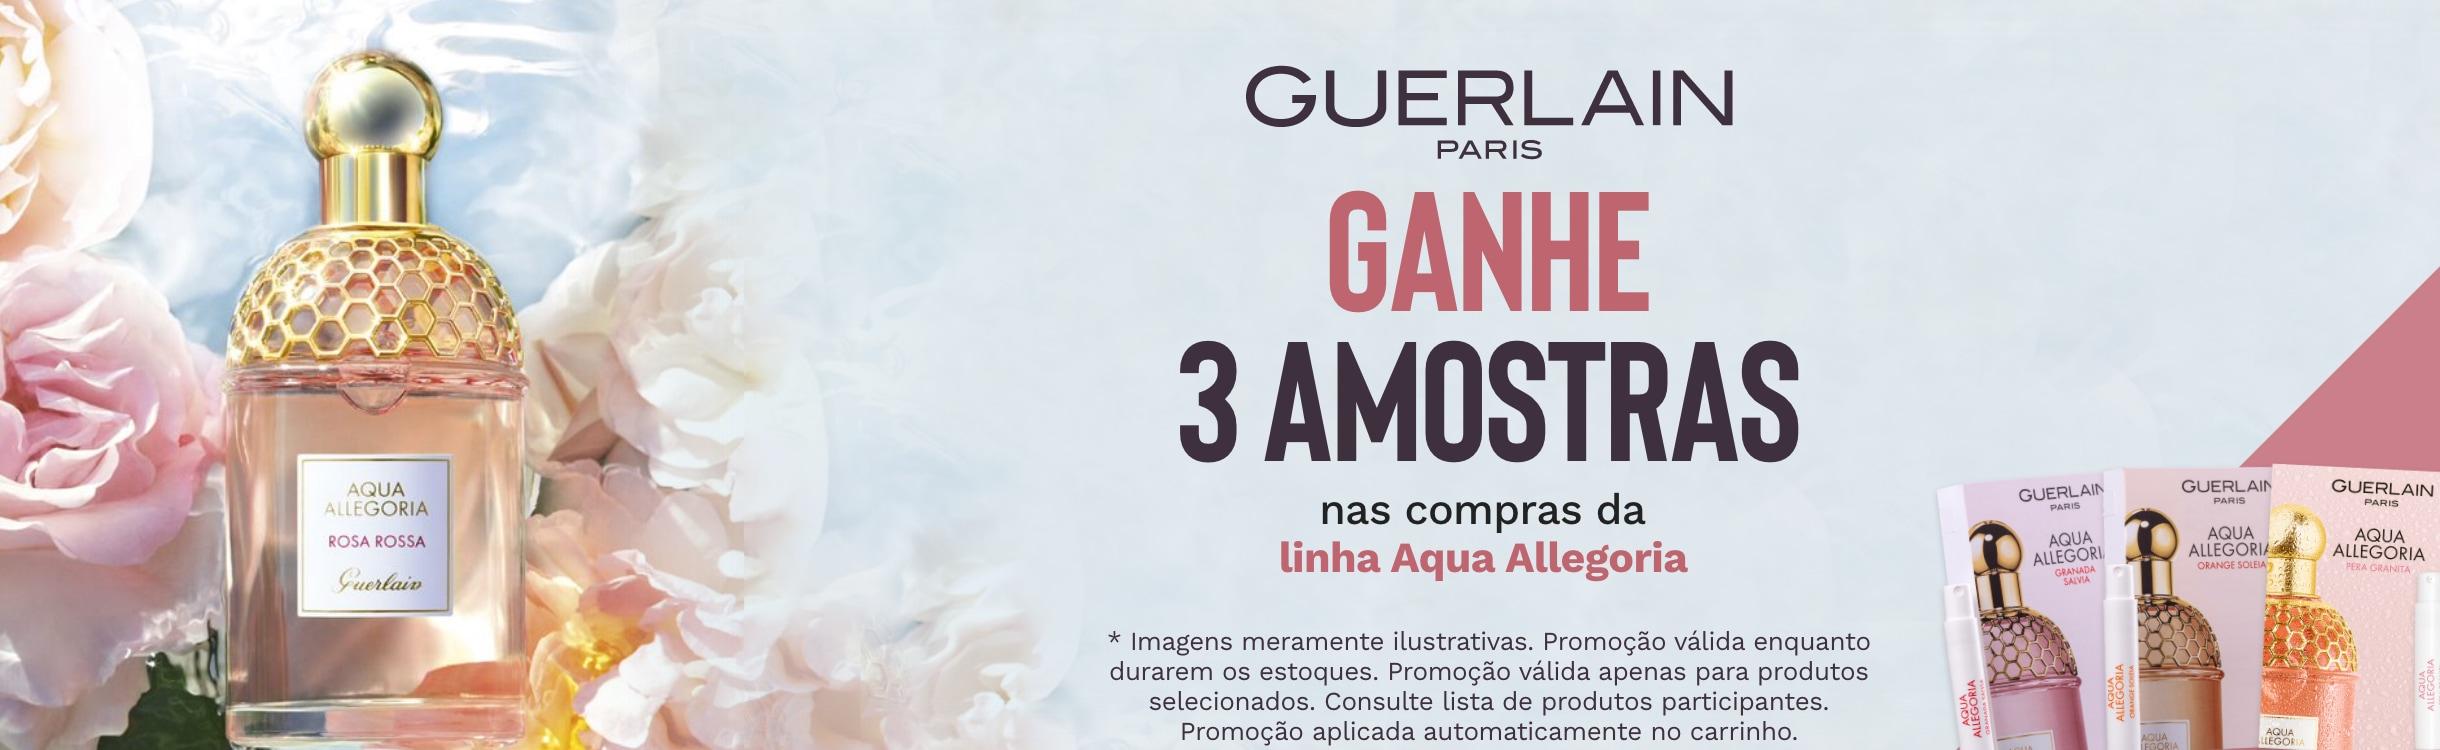 Perfumes Guerlain